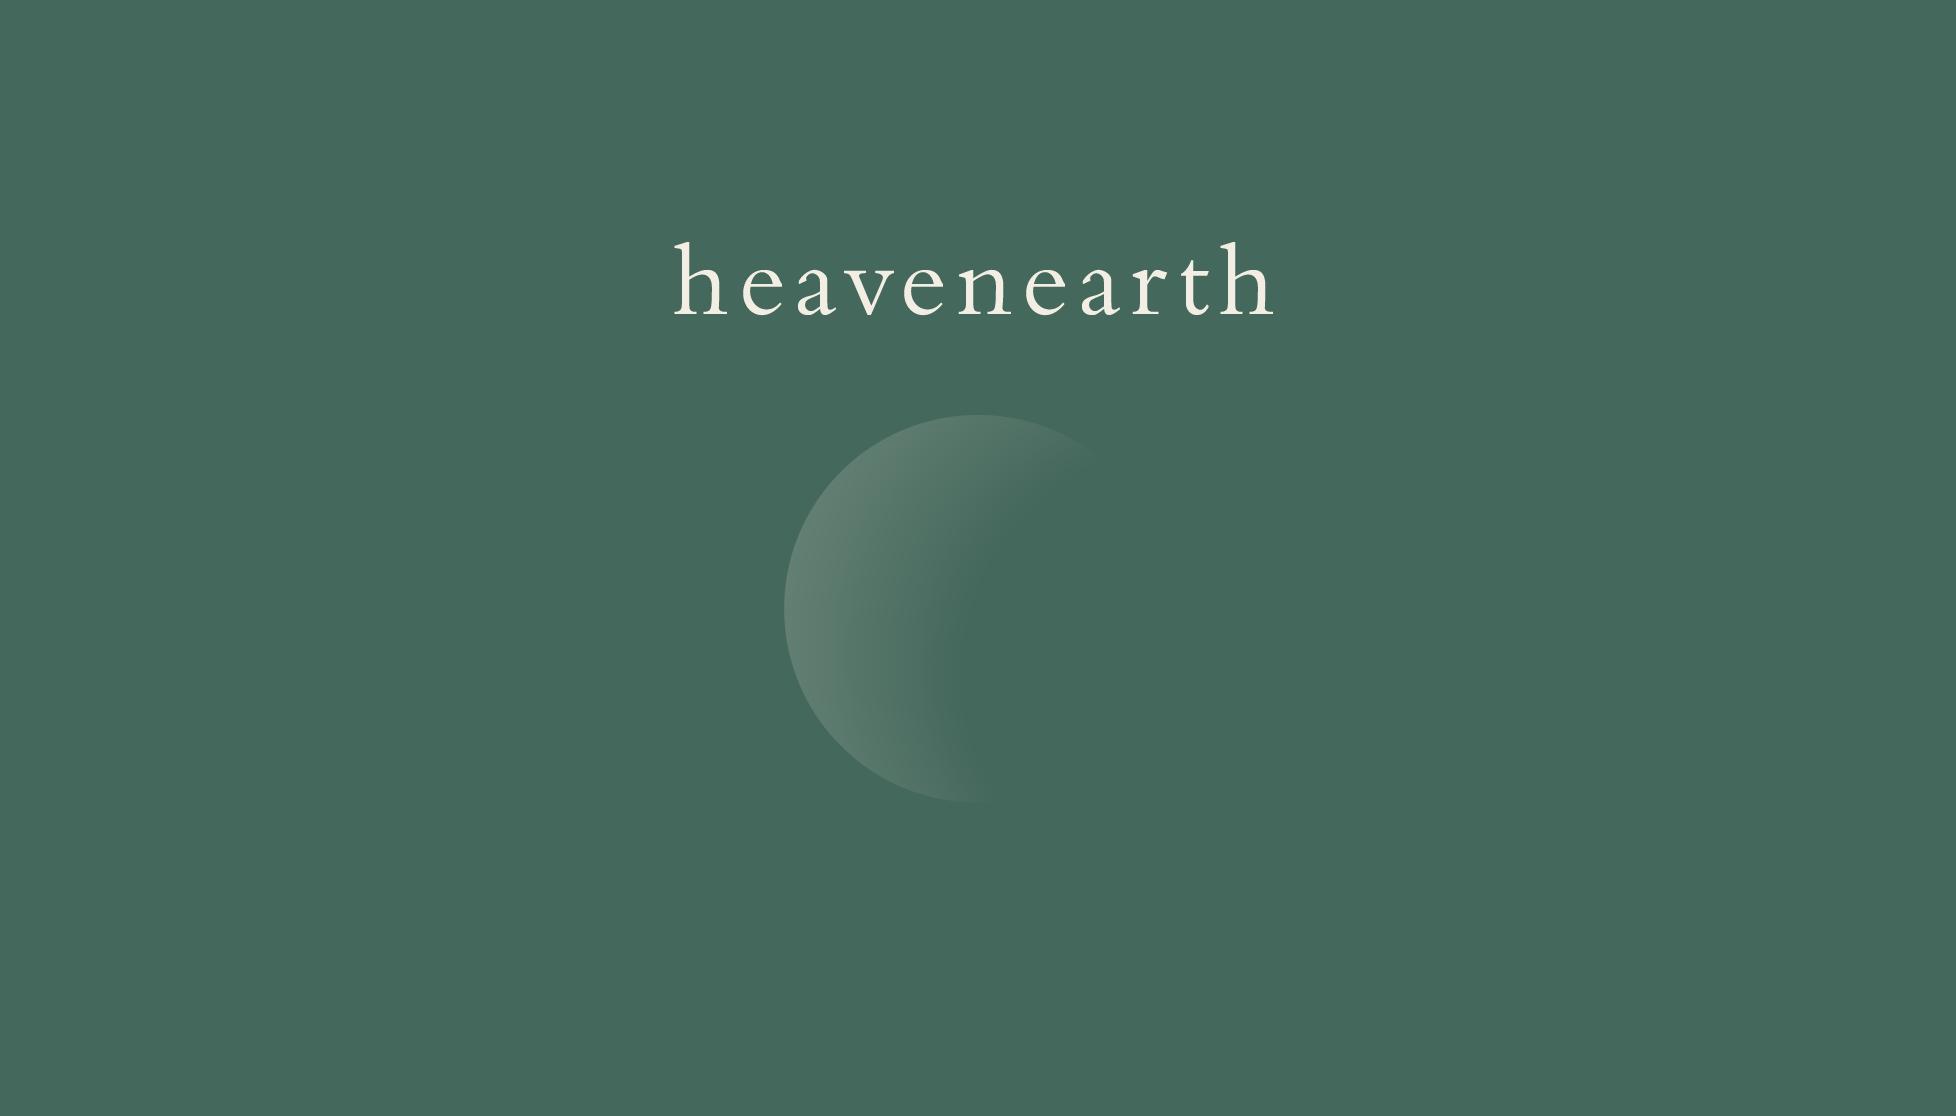 heavenearth2.png